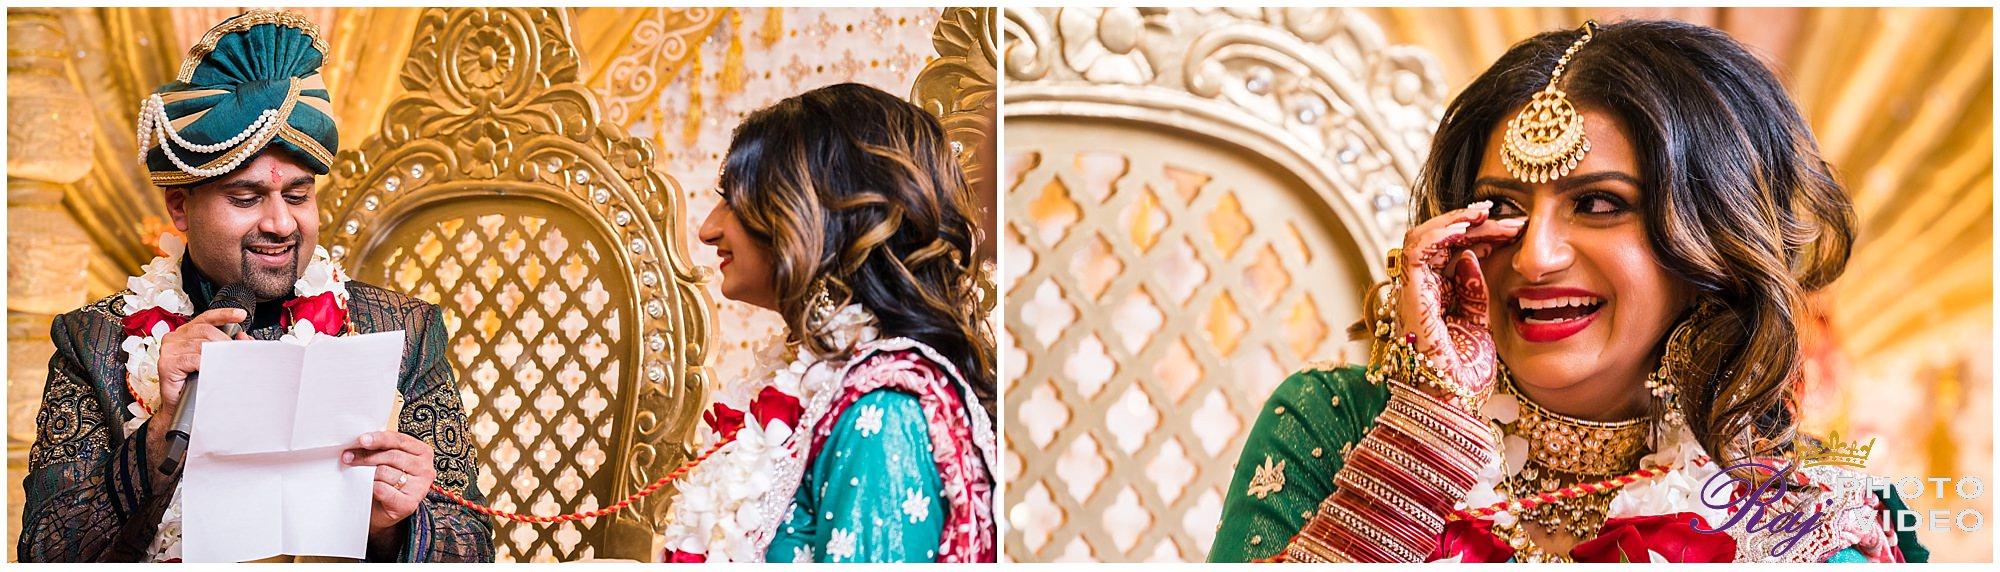 Sri-Guruvaayoorappan-Temple-Marlboro-NJ-Indian-Wedding-Chiyomi-Scott-00026.jpg